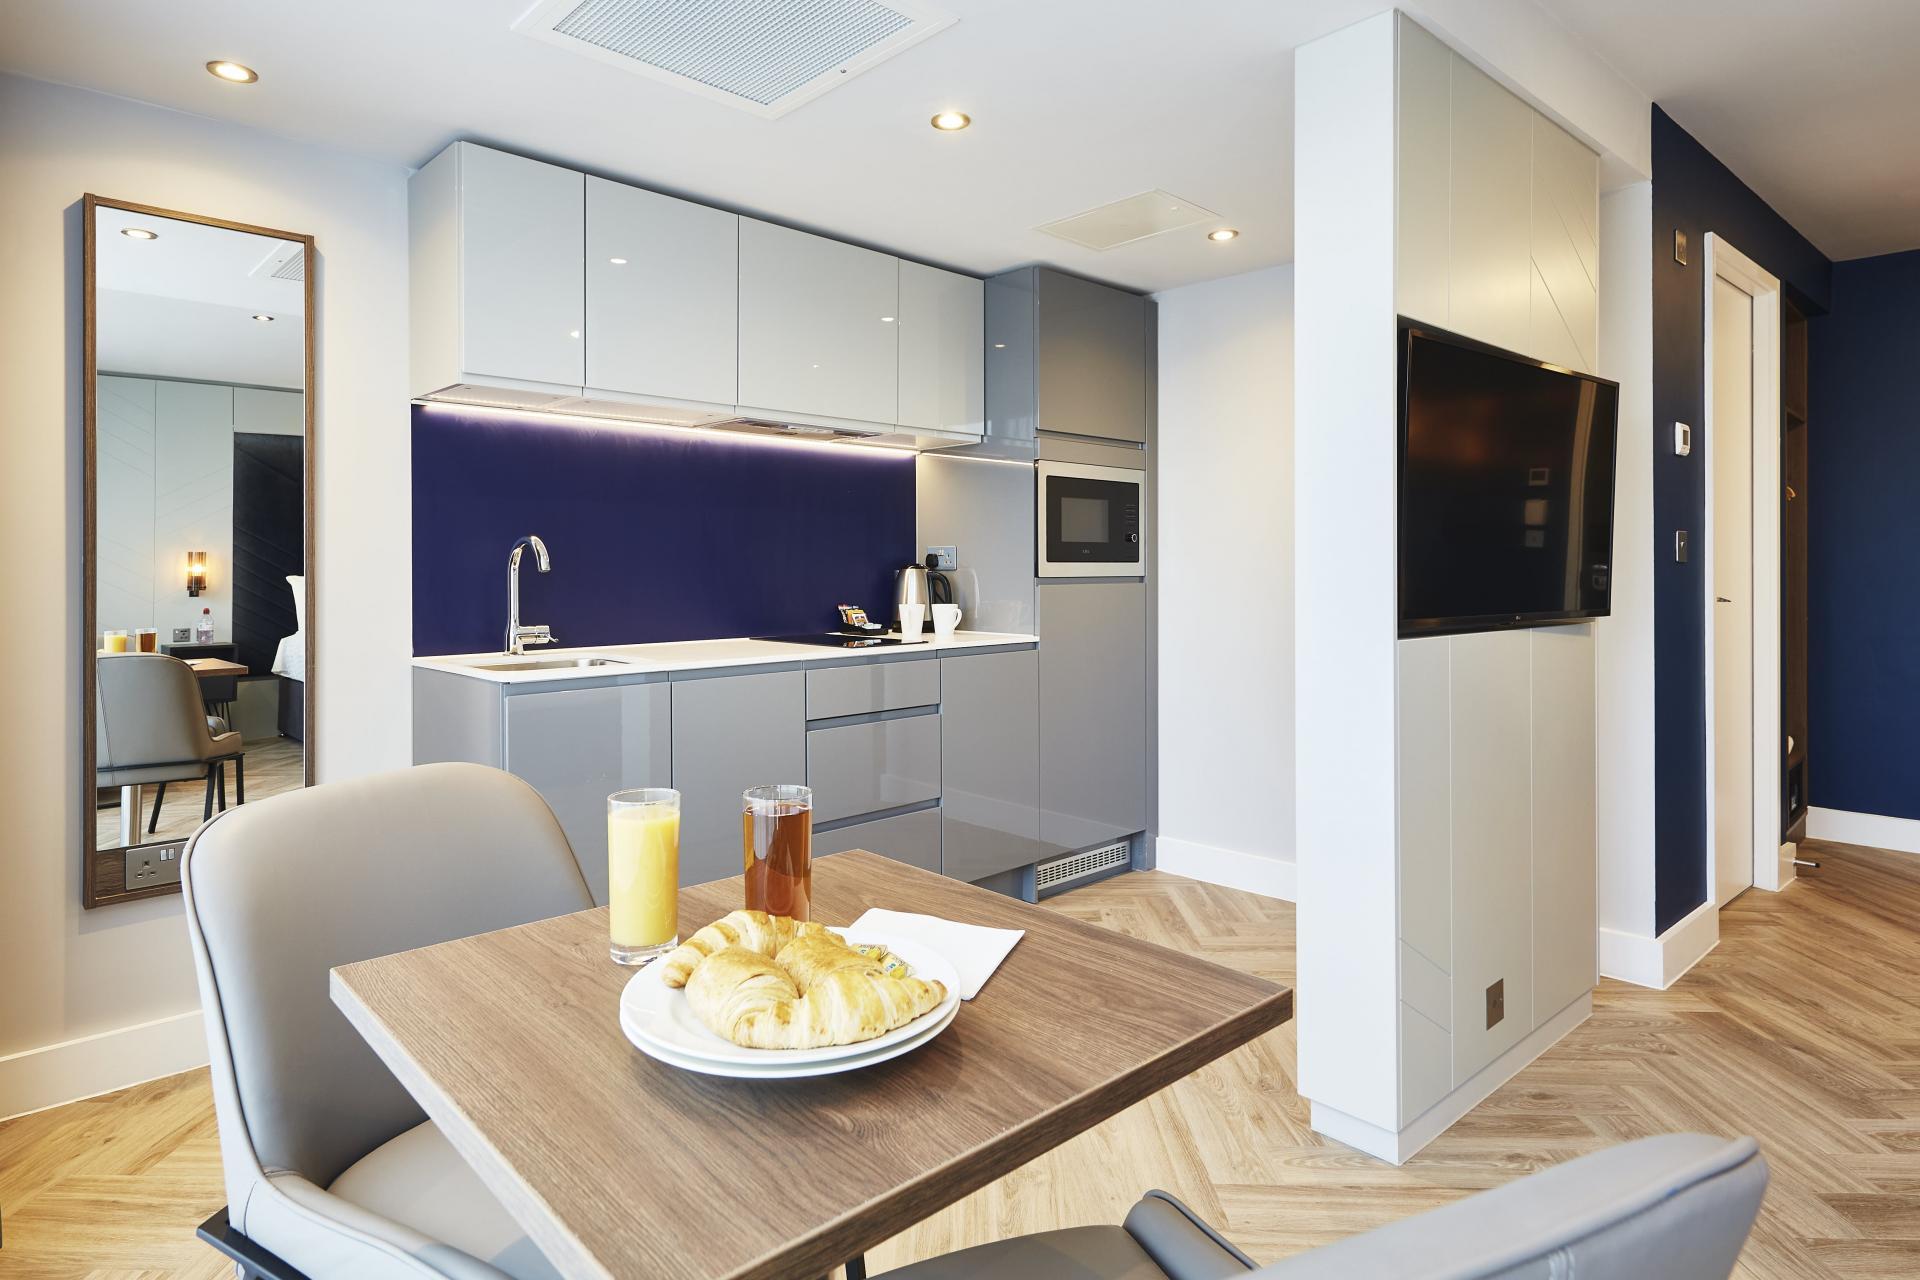 Kitchen at Roomzzz Newcastle City Apartments - Citybase Apartments